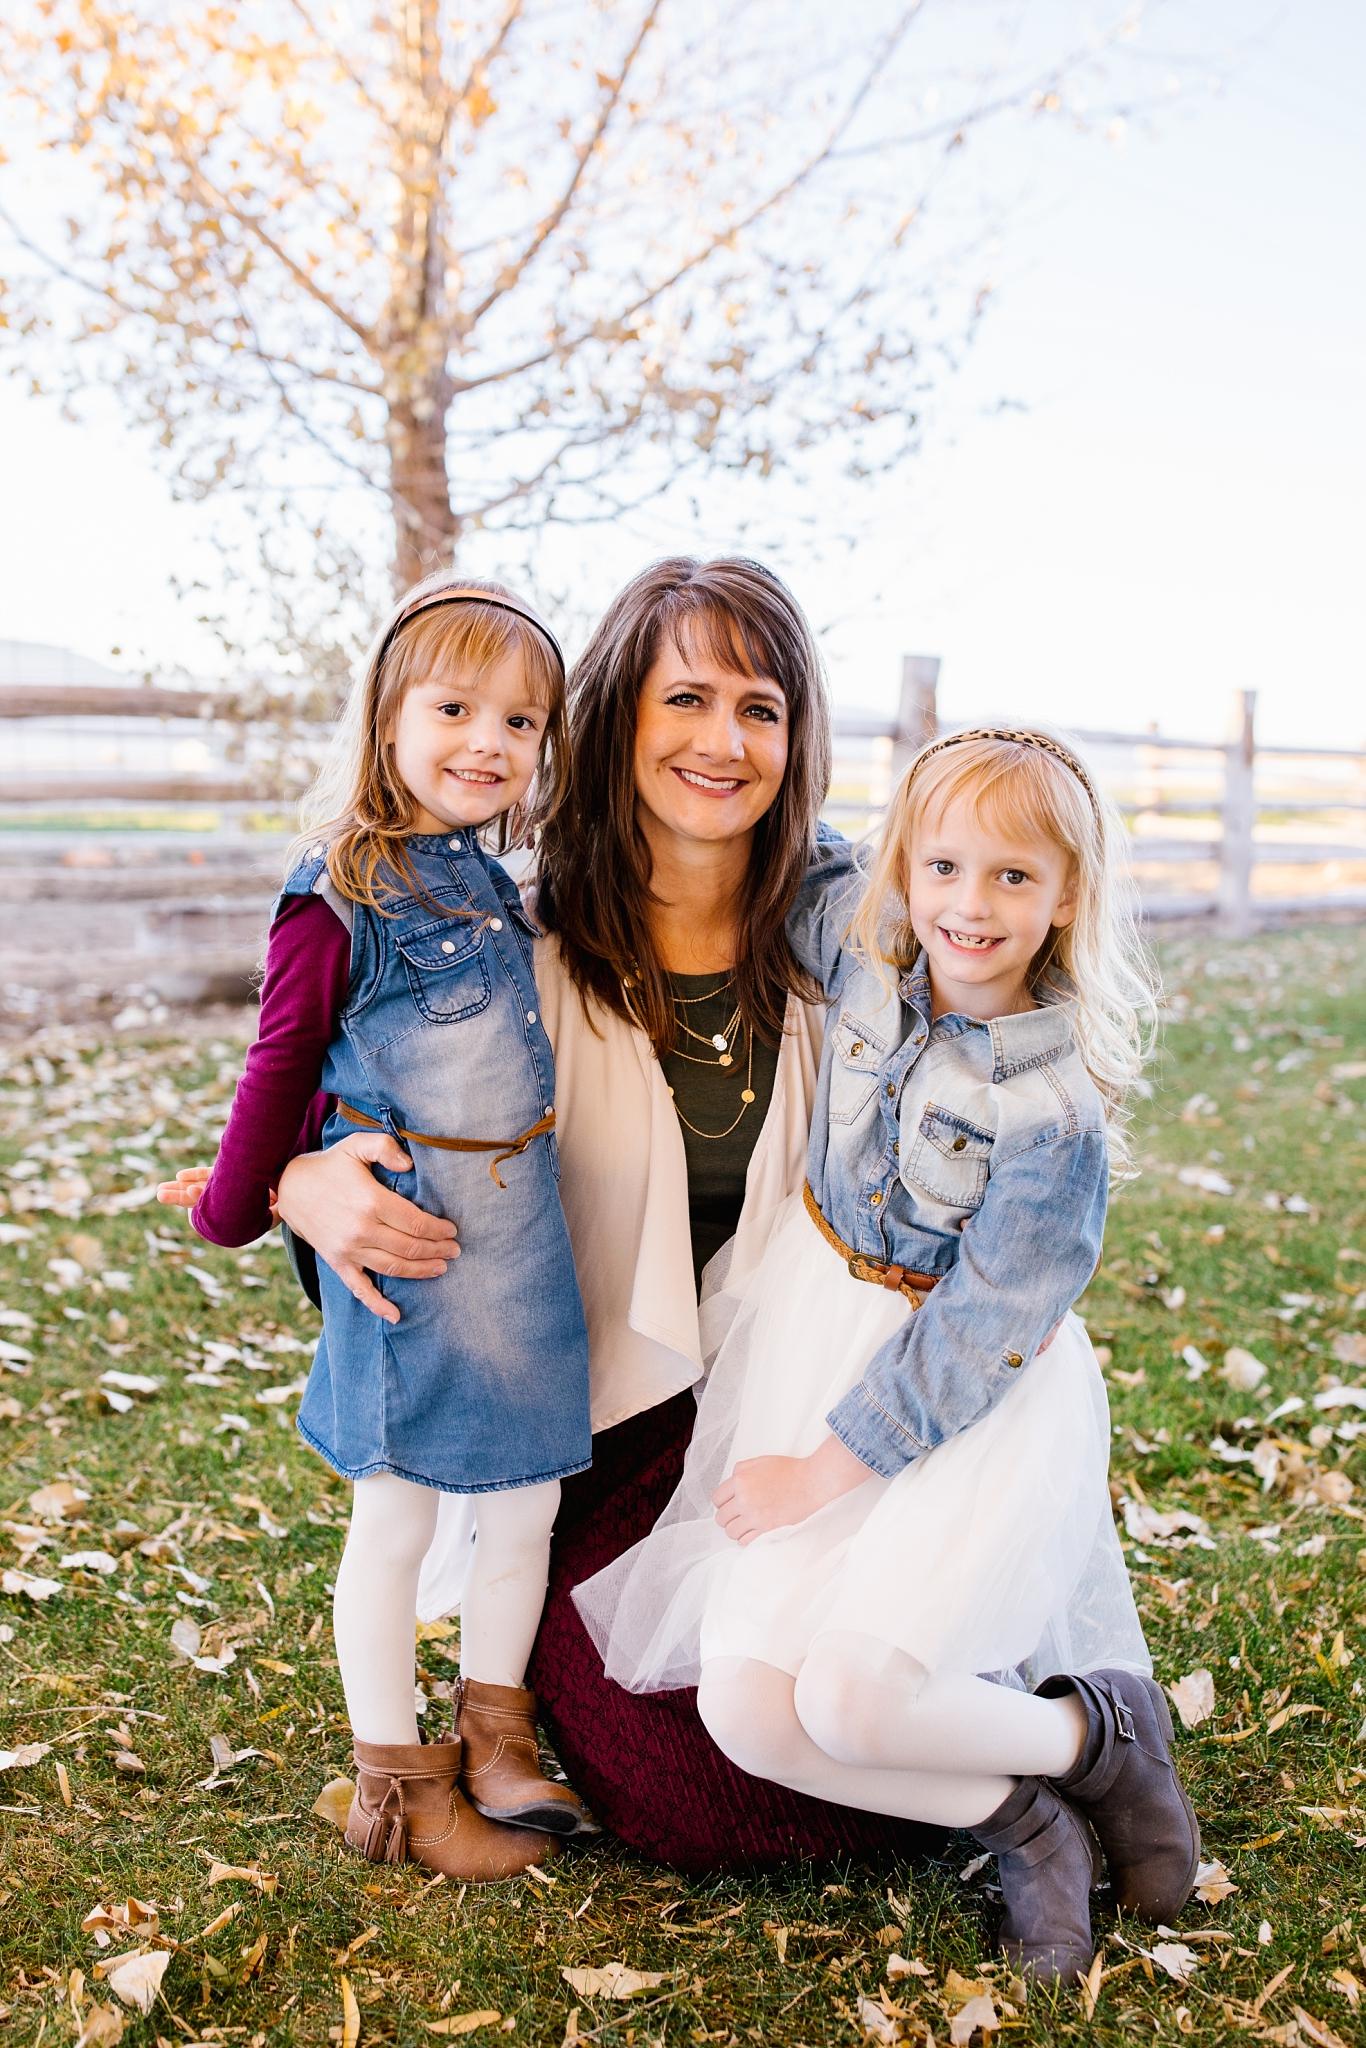 Mickelsen-37_Lizzie-B-Imagery-Utah-Family-Photographer-Lifestyle-Photography-Salt-Lake-City-Park-City-Utah-County.jpg